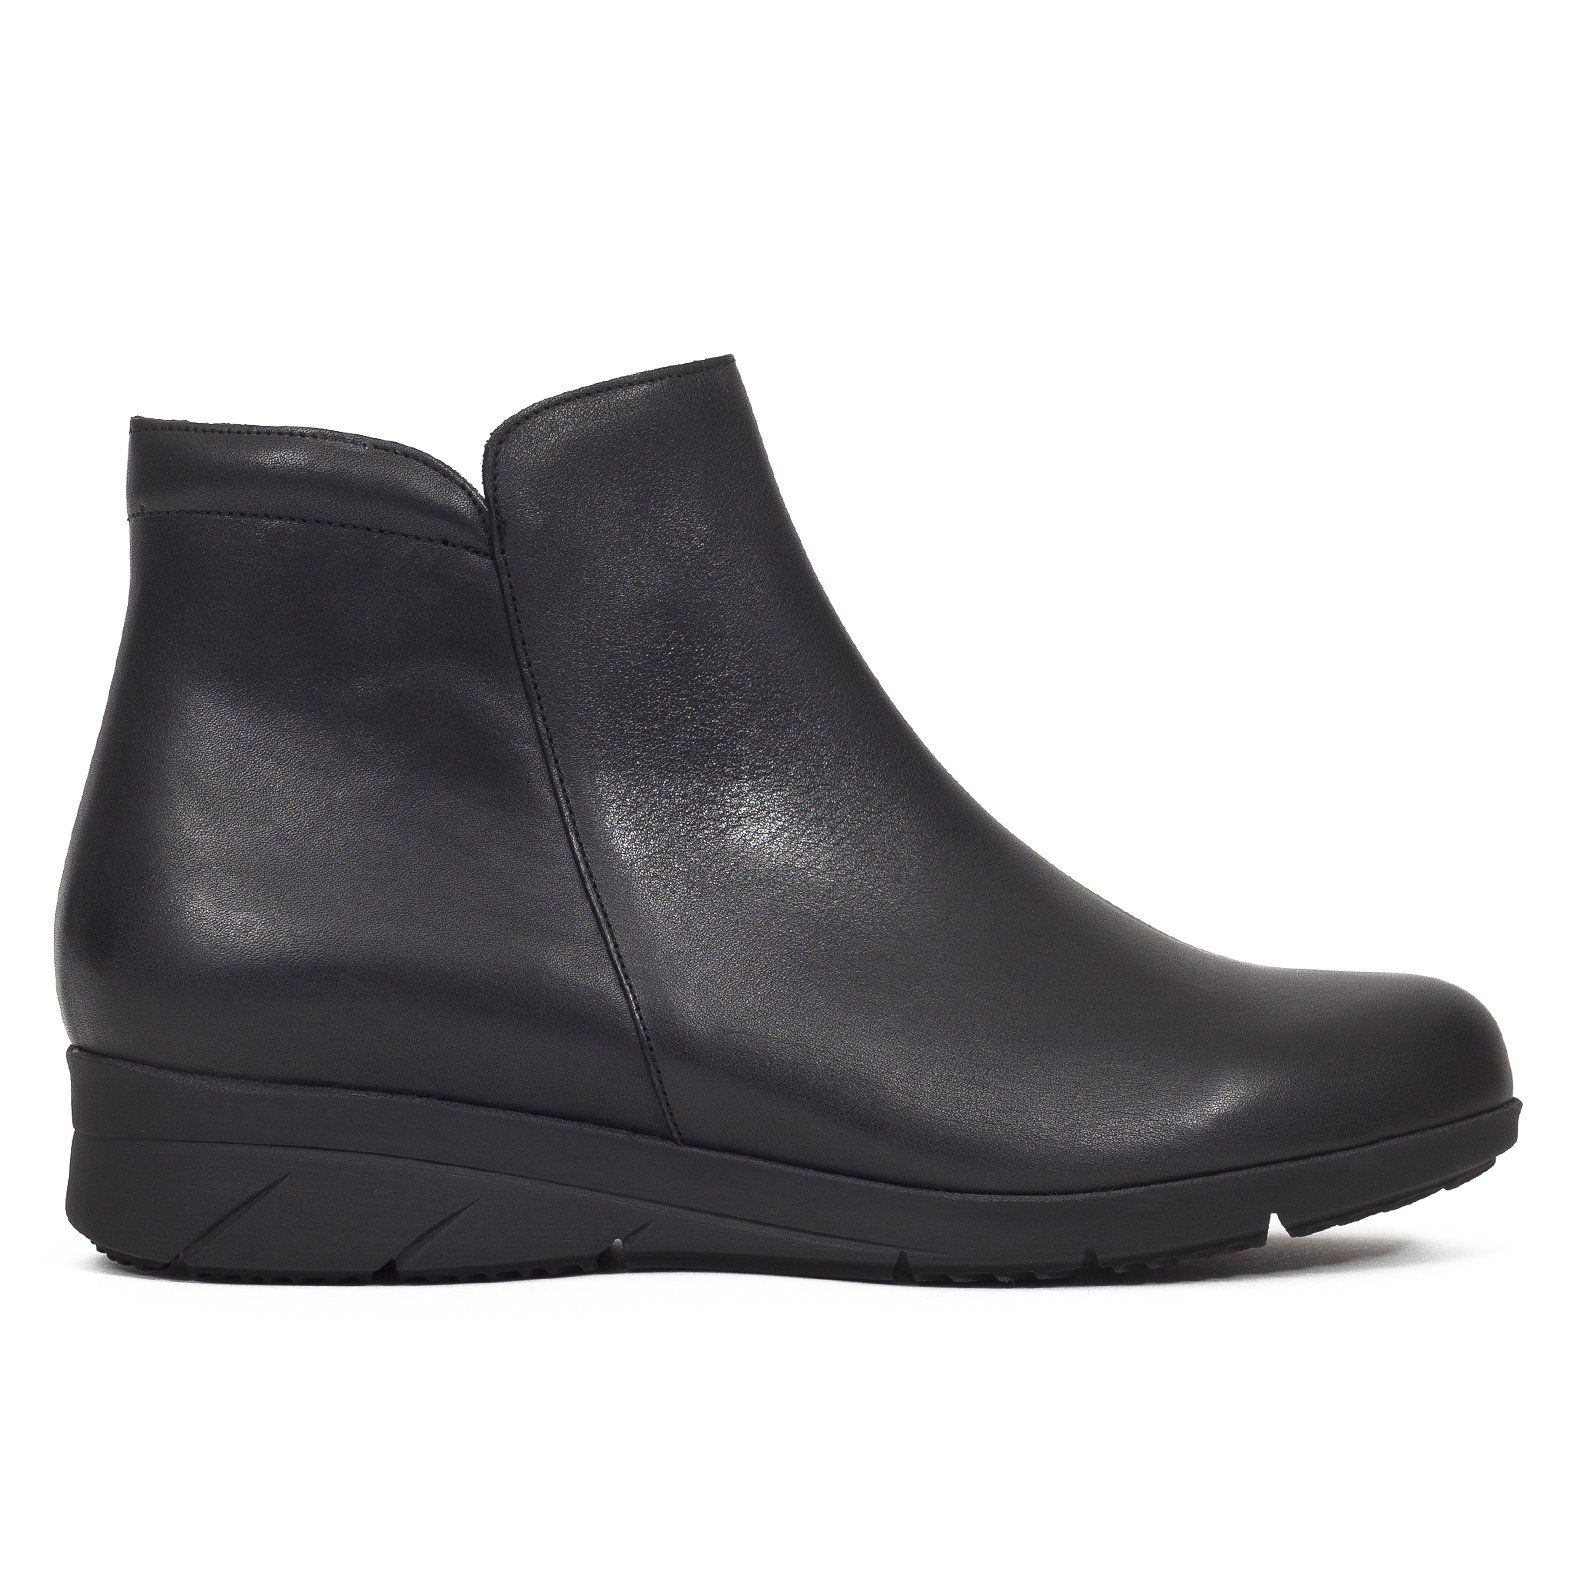 f23b7585cb9 Botín de mujer cómodo negro YOGA – miMaO made in Spain – miMaO ShopOnline